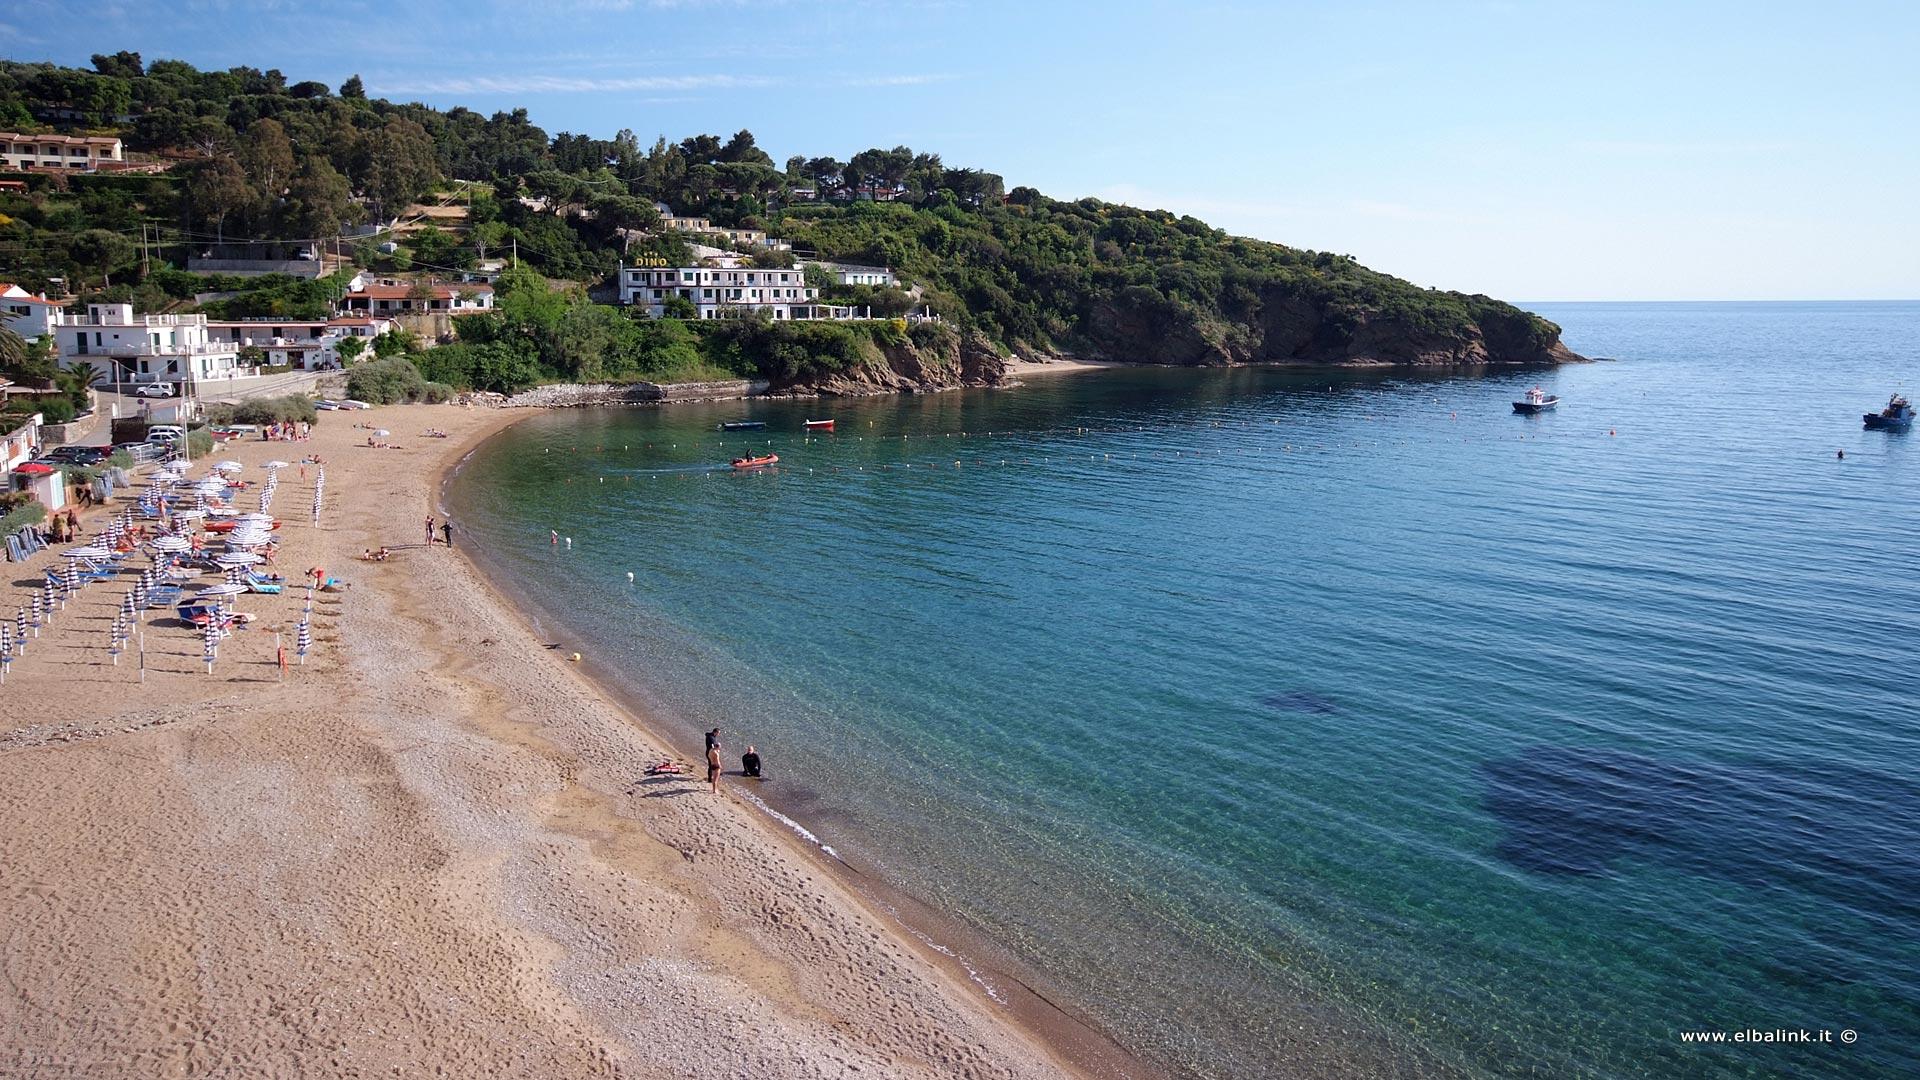 Pareti Fotografie : Strand von pareti in capoliveri strände insel elba